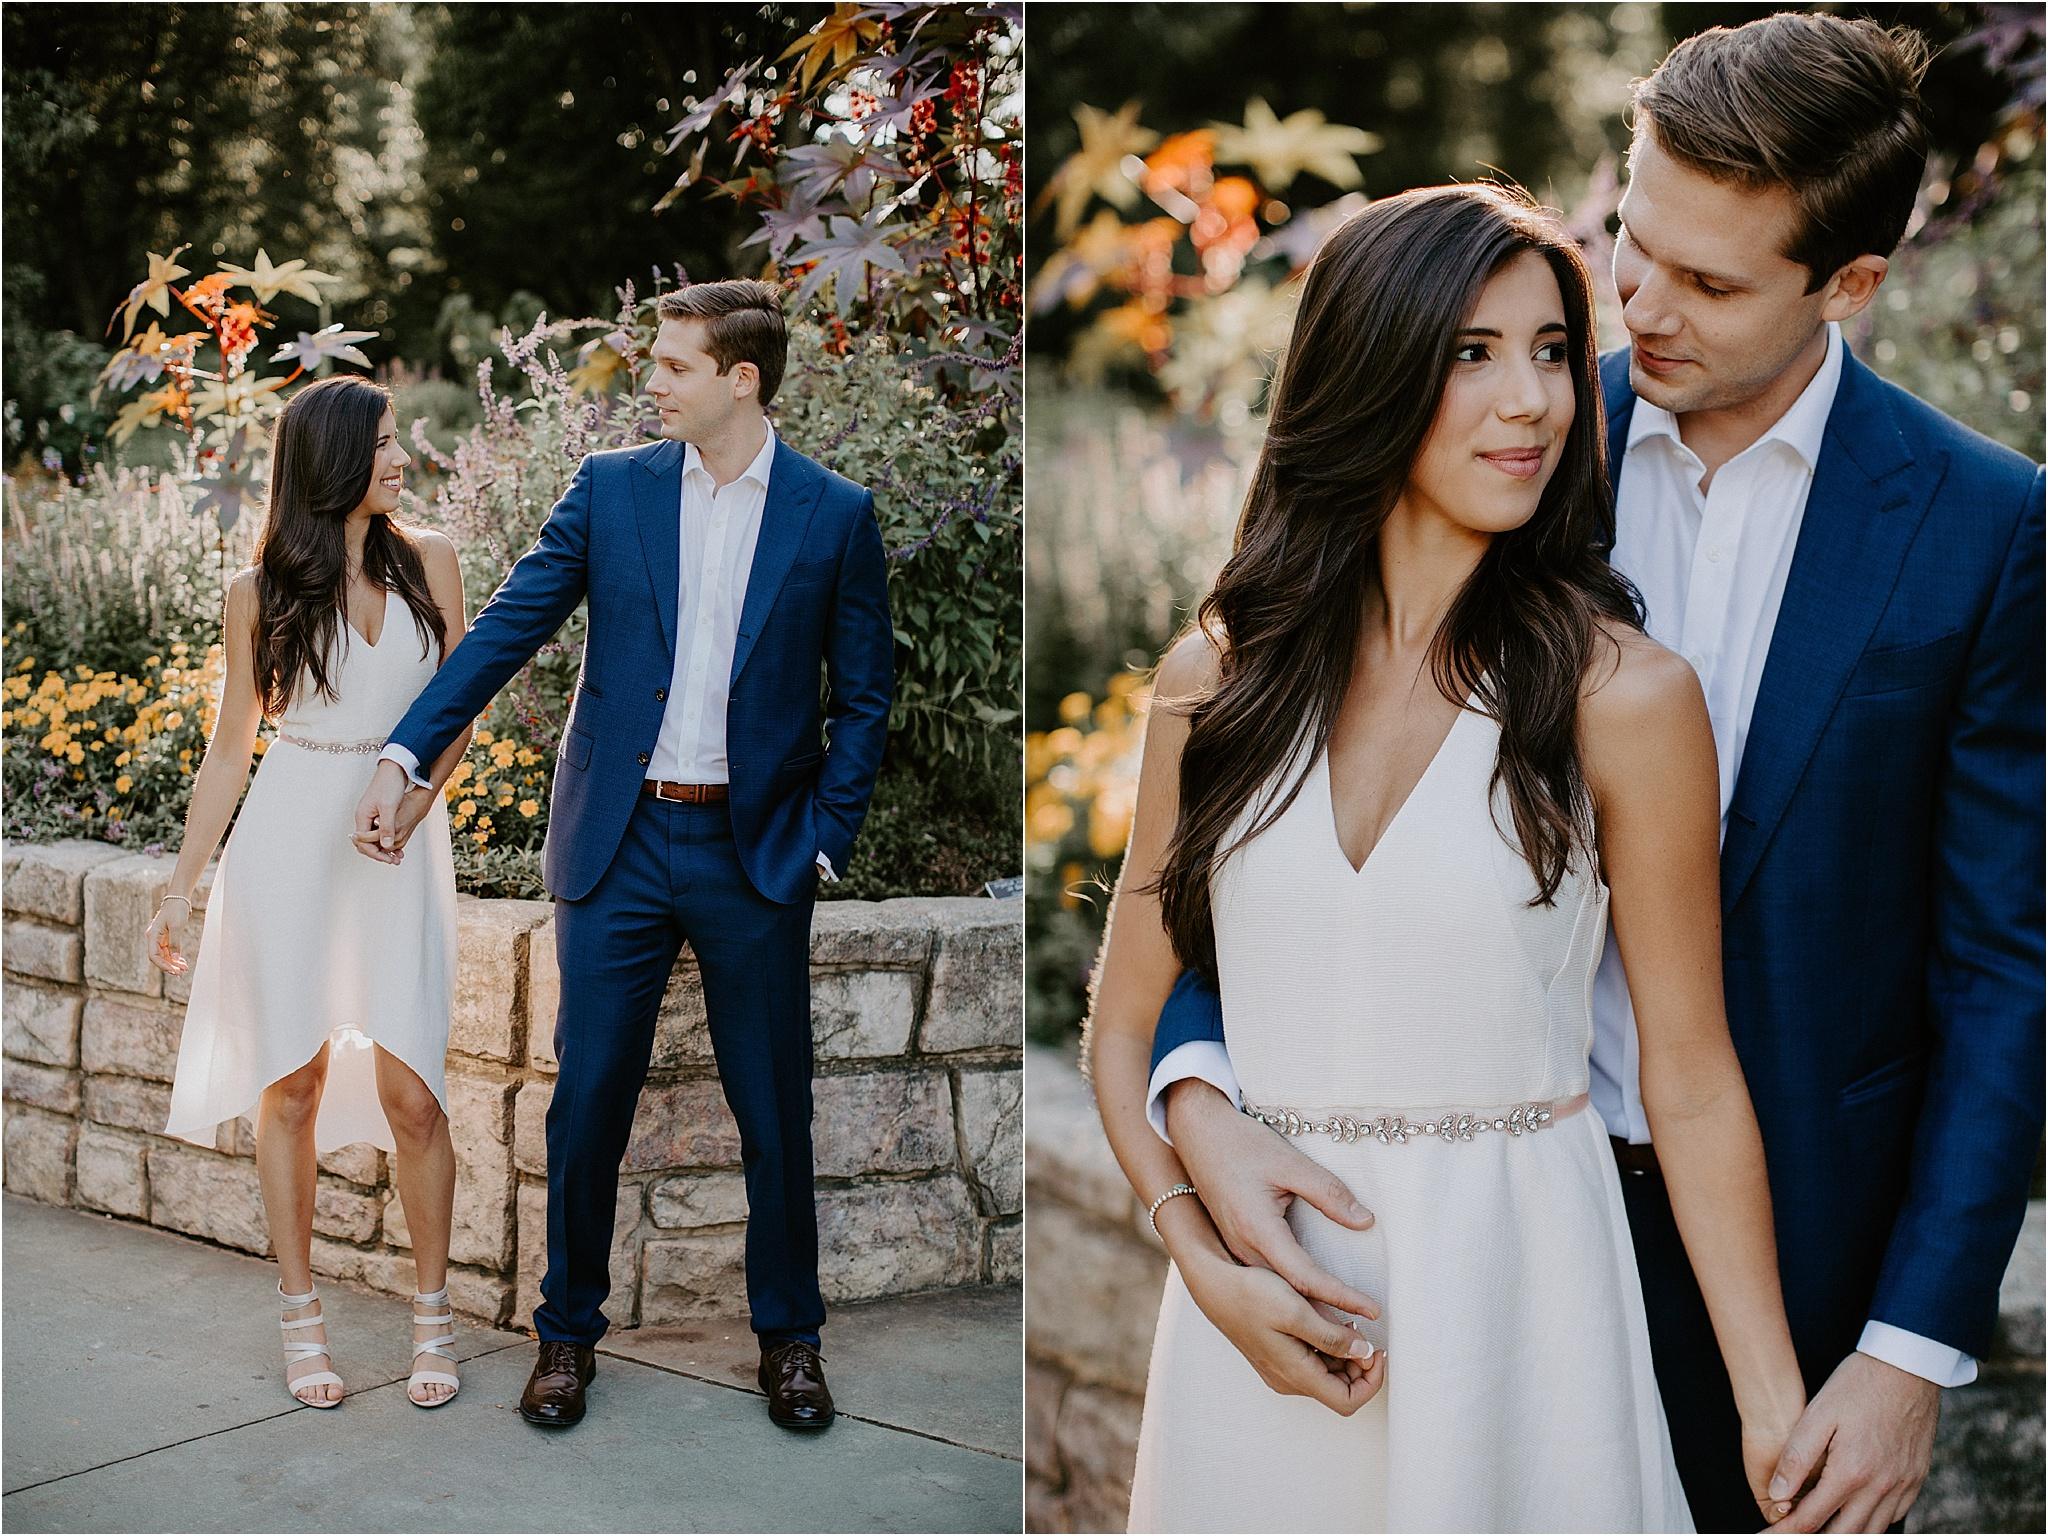 Sarah_Brookhart_Baltimore_Wedding_Photographer_0003.jpg